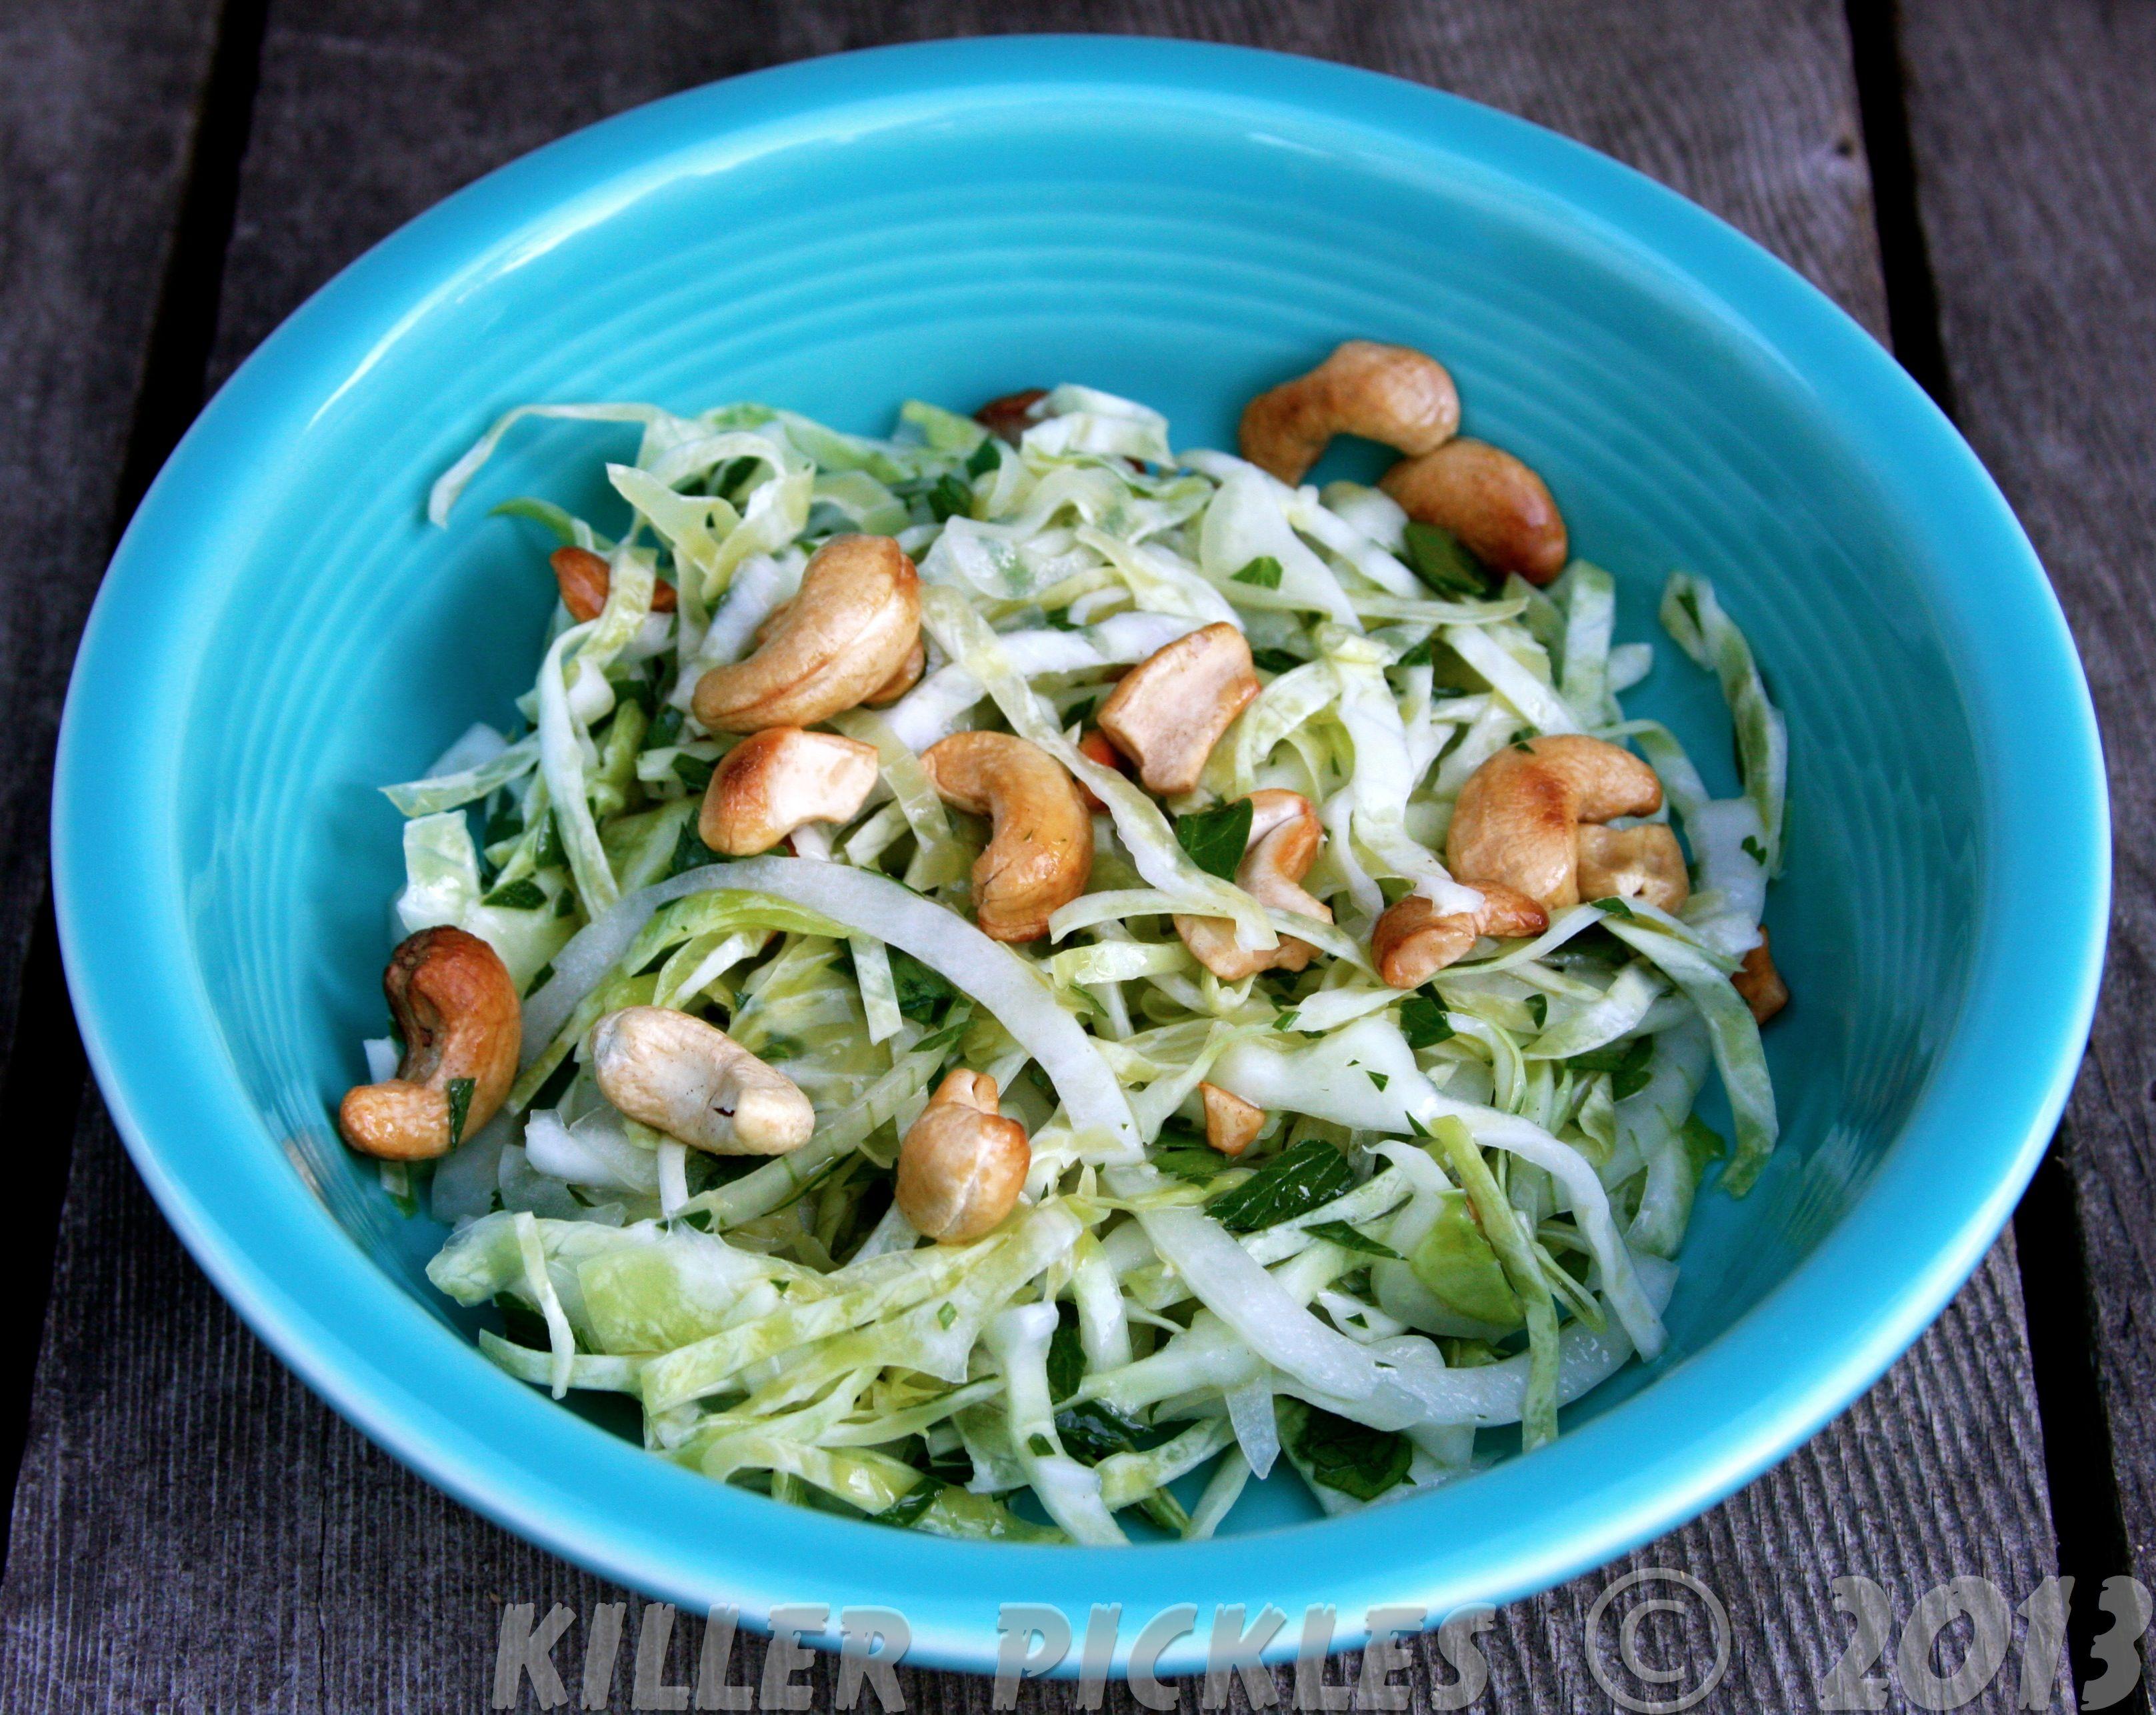 Cabbage & Cashew Salad